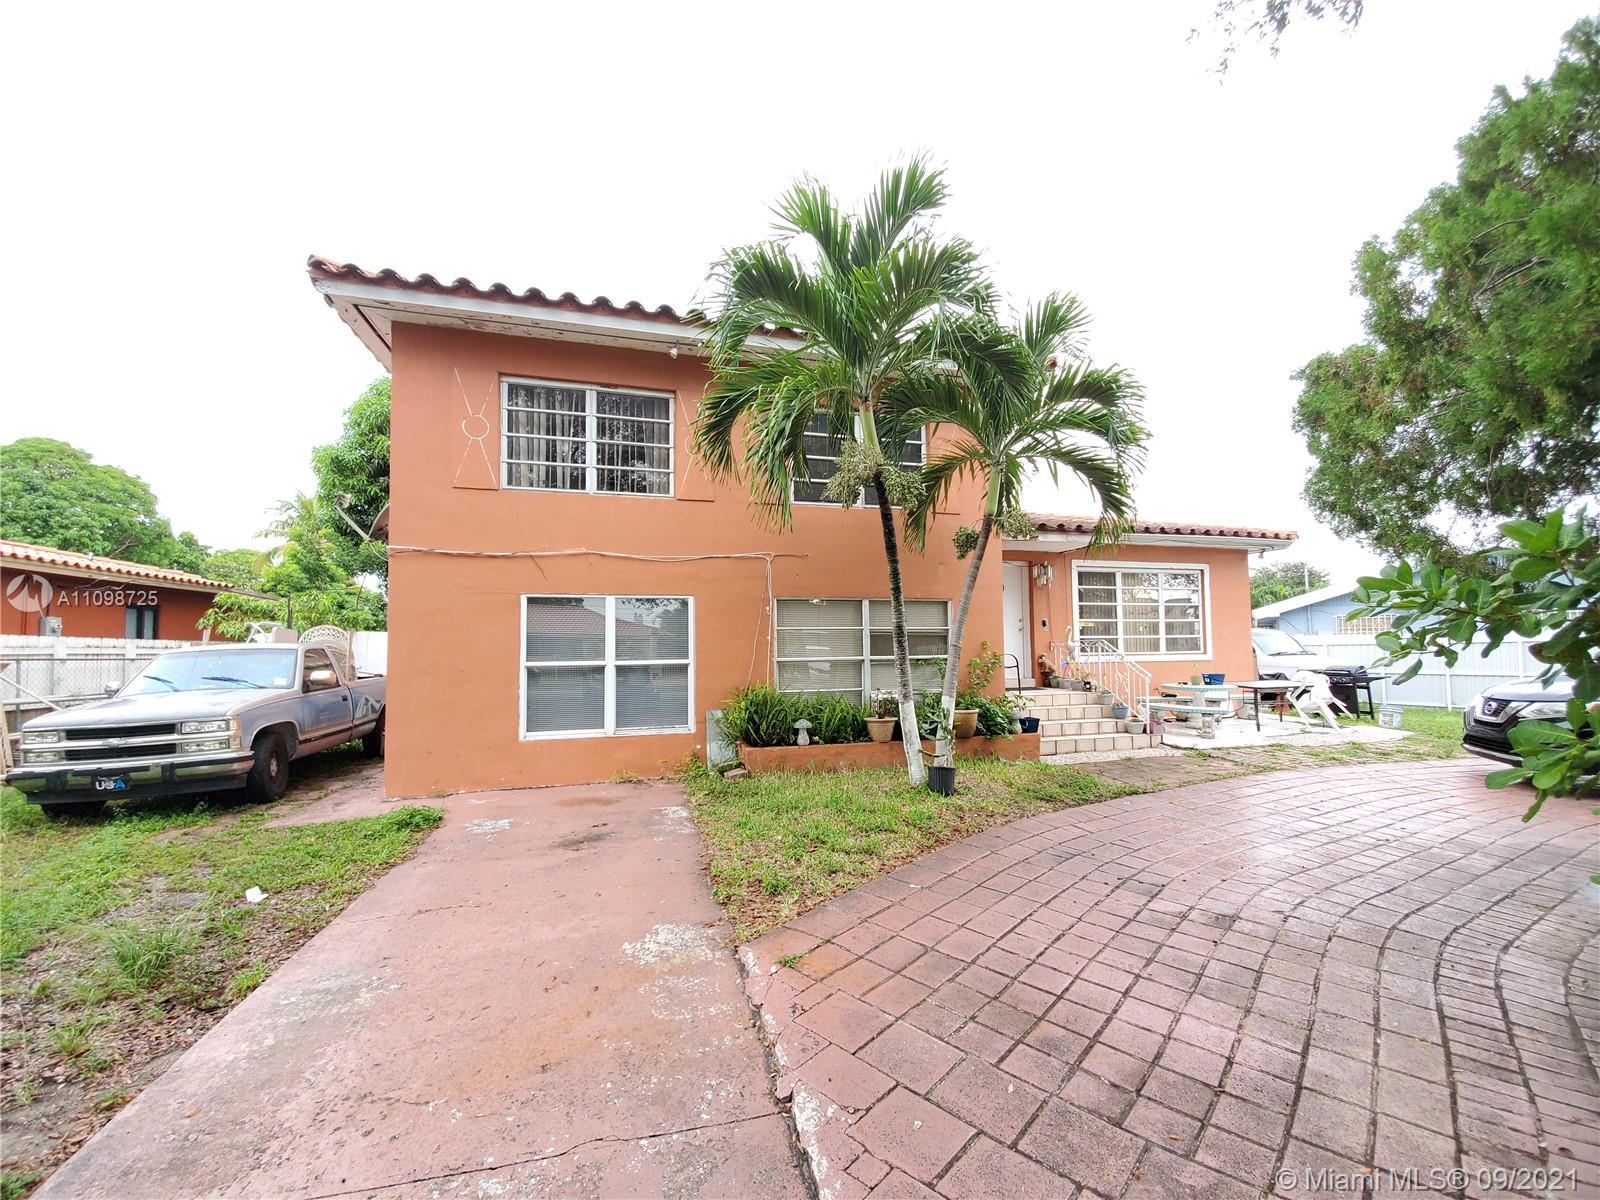 Single Family Home,For Sale,30 Pen Na Na Dr, Hialeah, Florida 33010,Brickell,realty,broker,condos near me